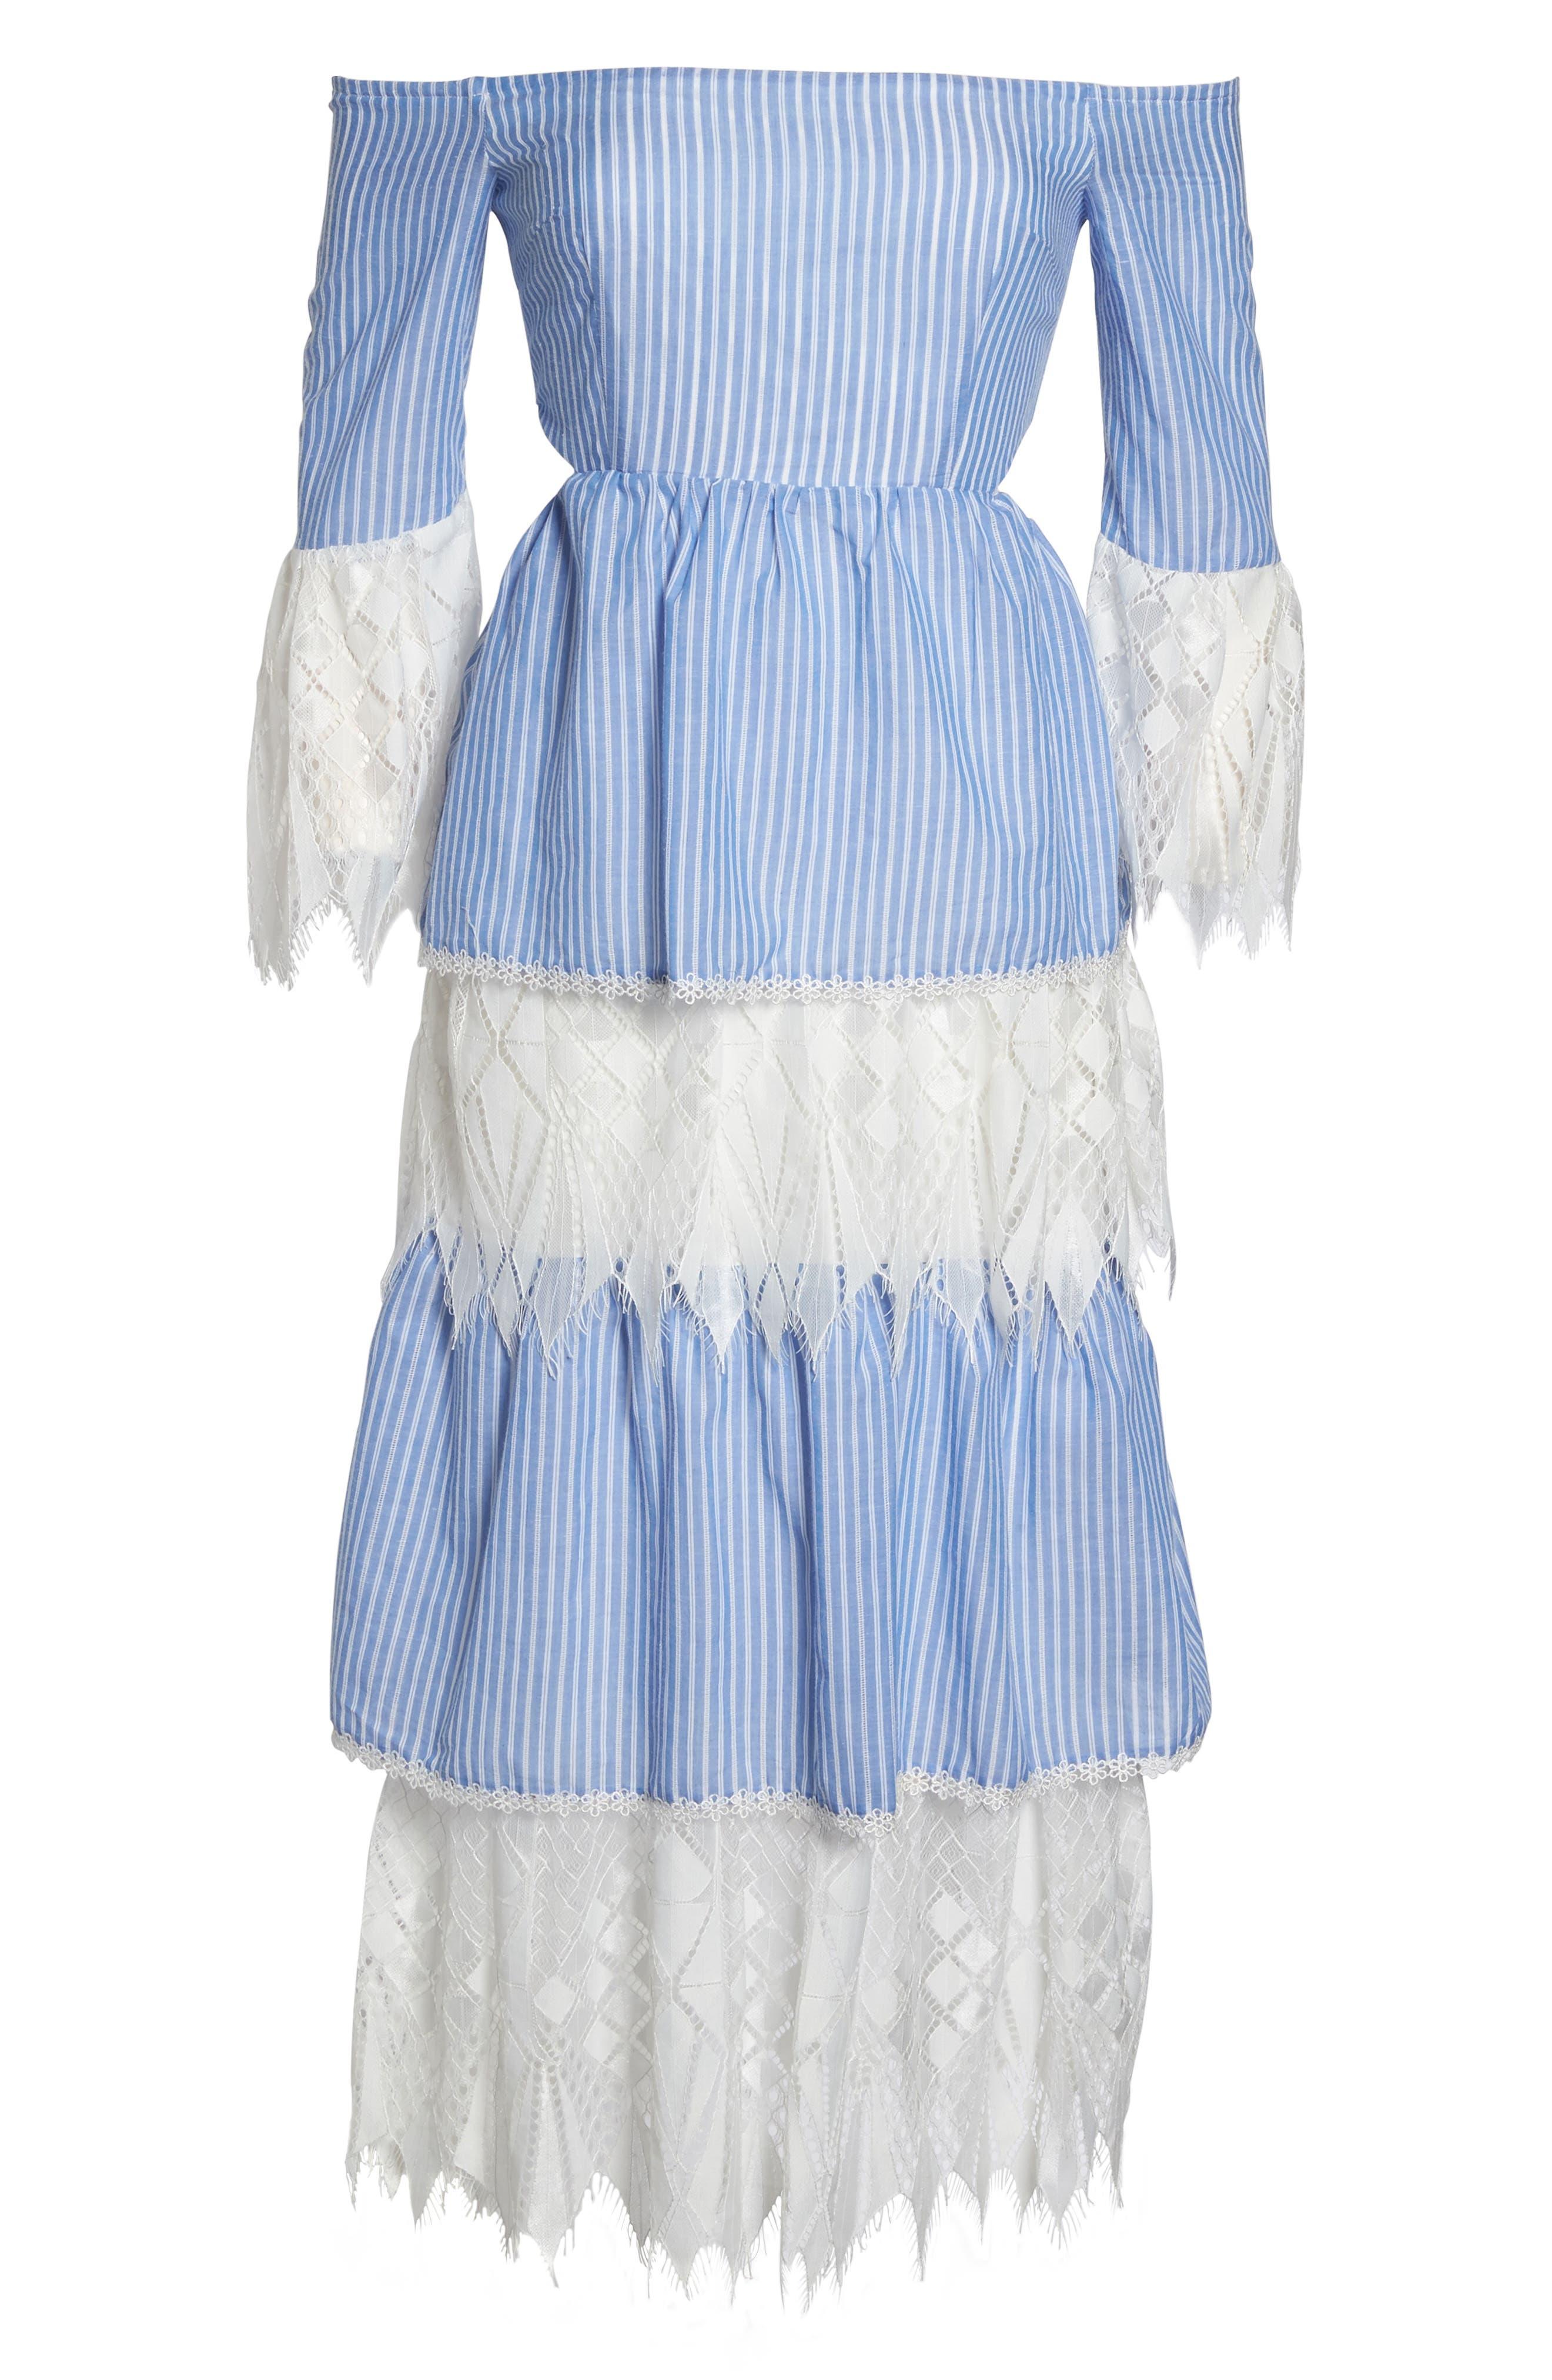 Addison Lace Tier Off the Shoulder Midi Dress,                             Alternate thumbnail 6, color,                             434